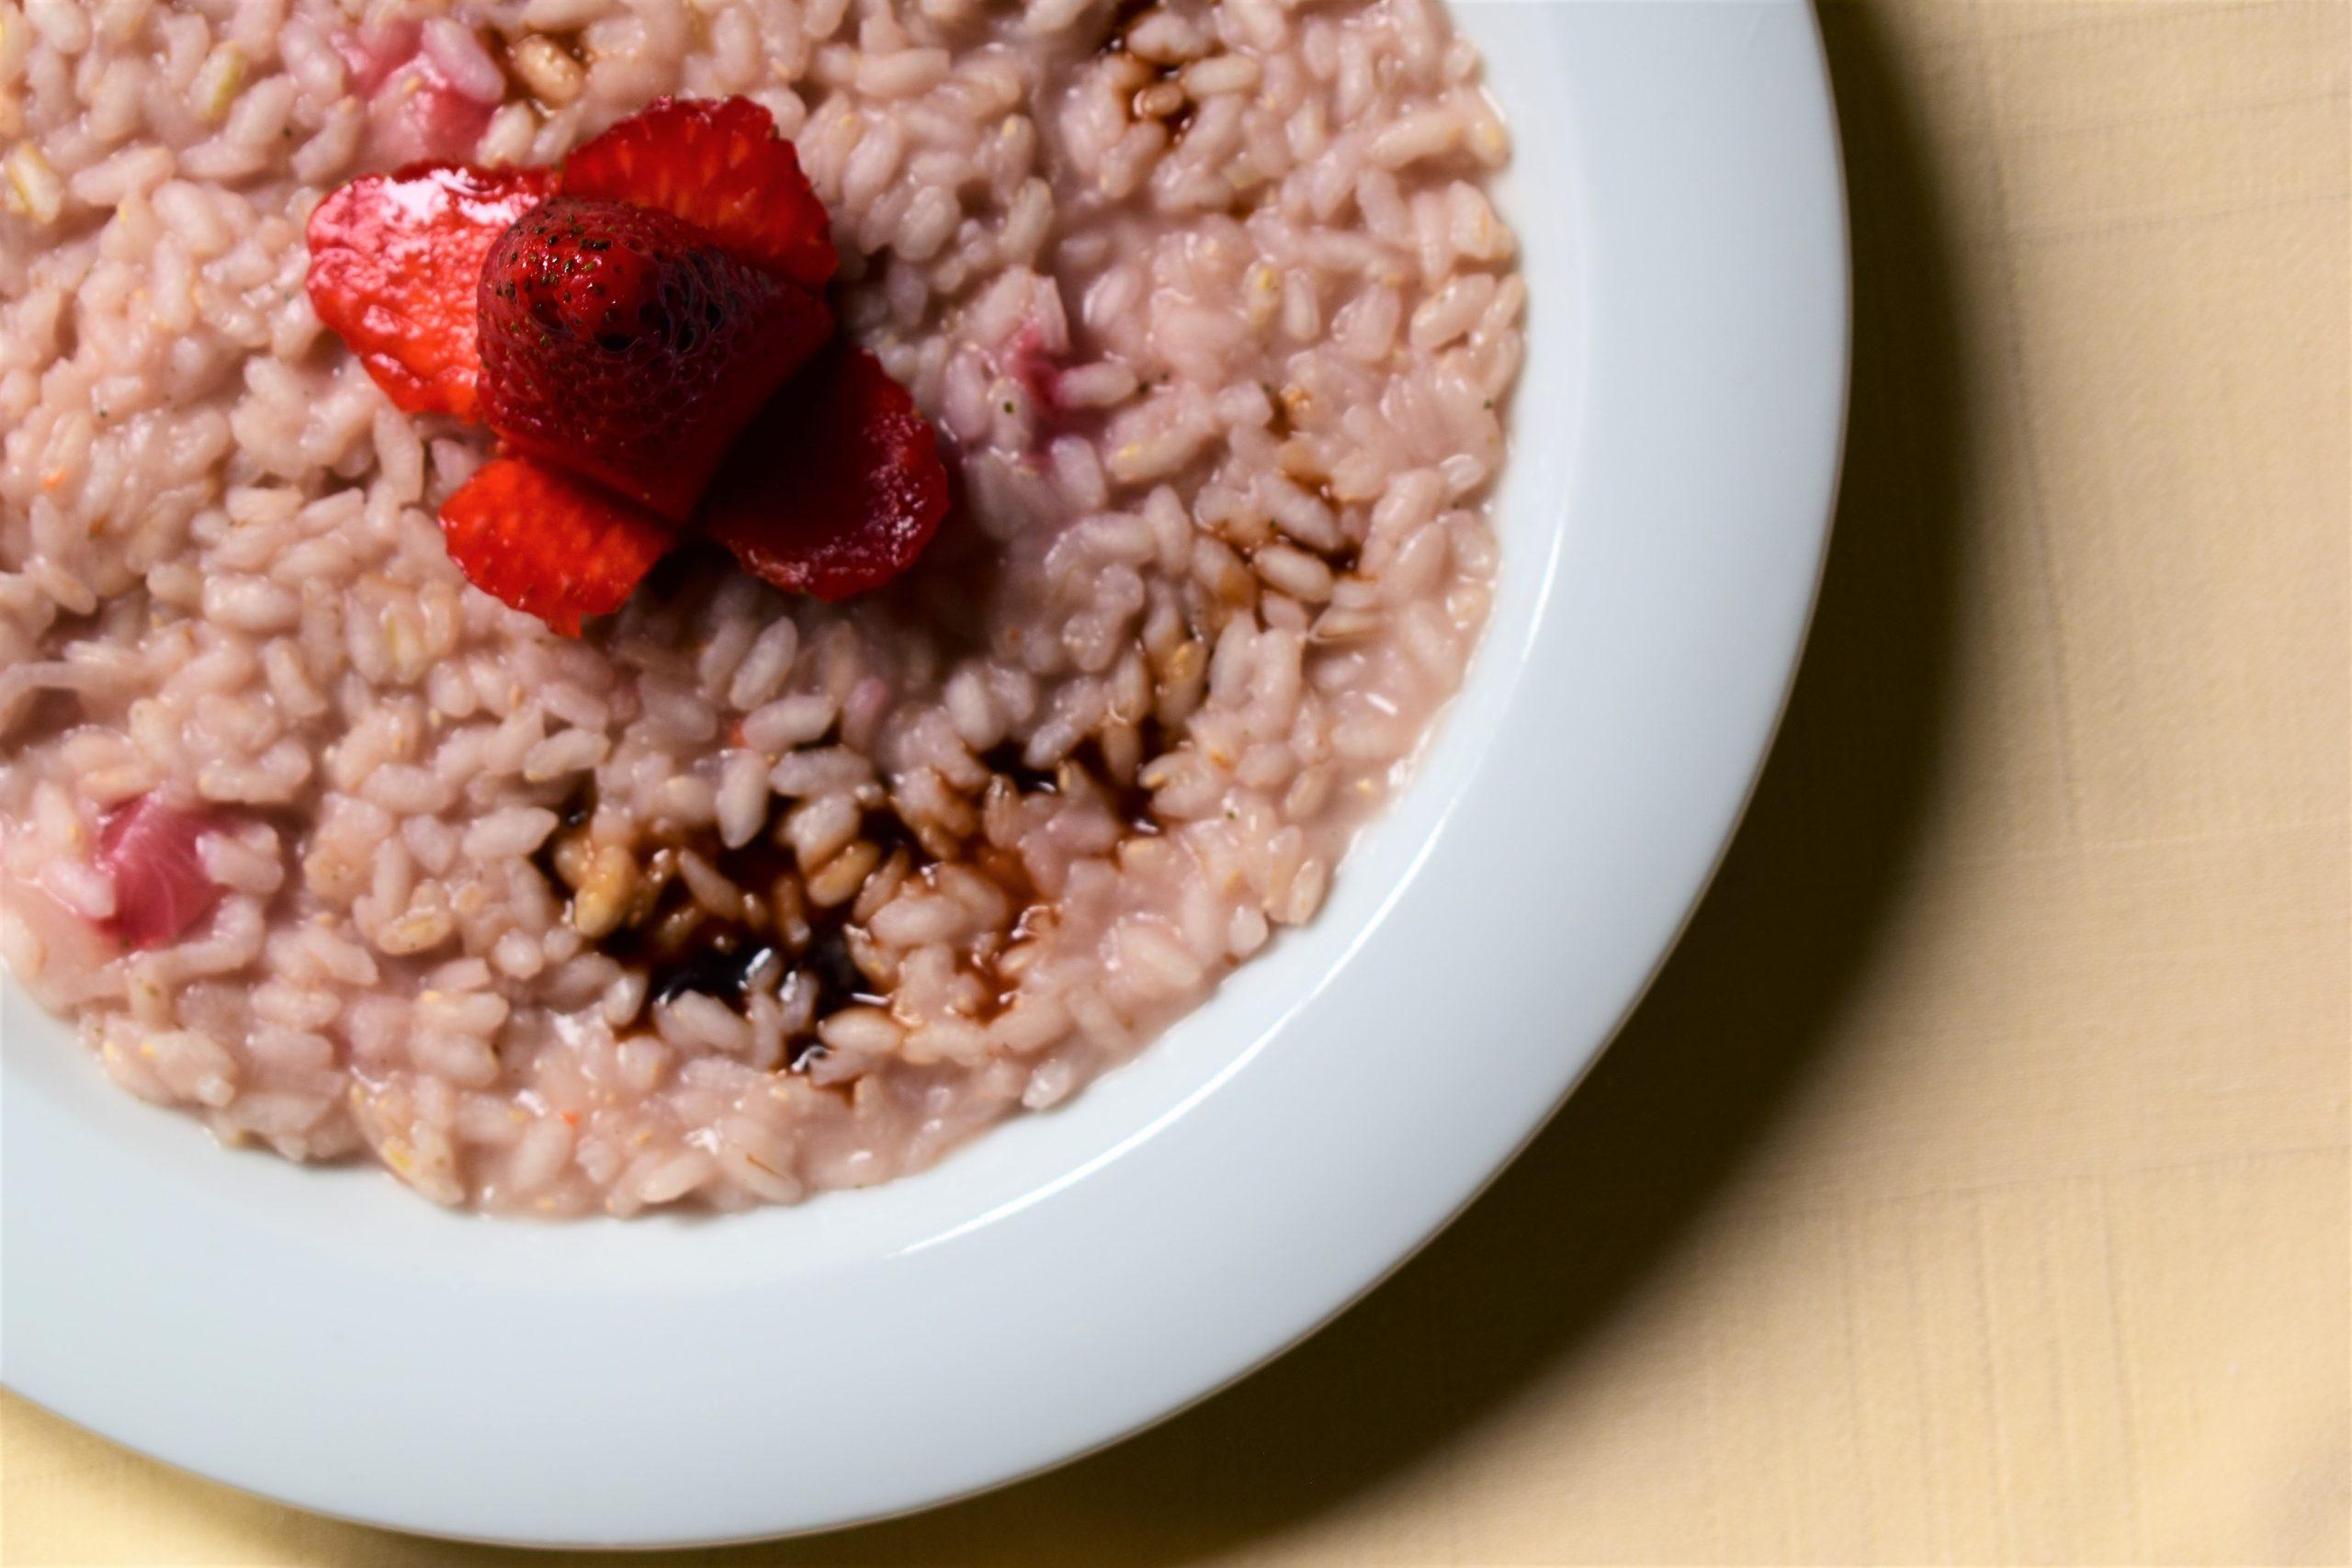 Strawberries risotto